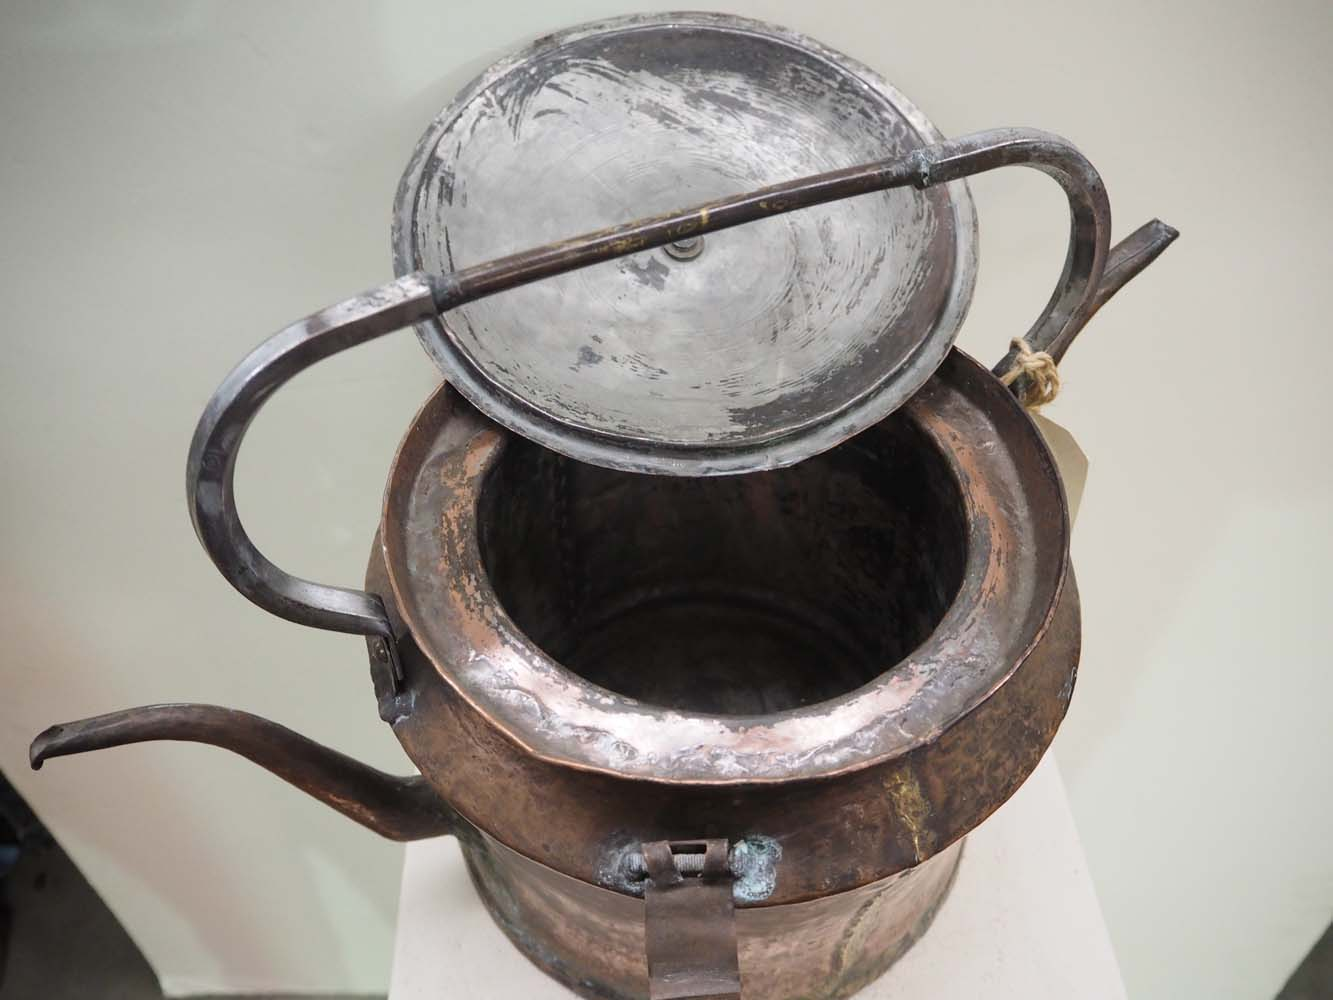 Ottoman period army copper hot water & tea kettle